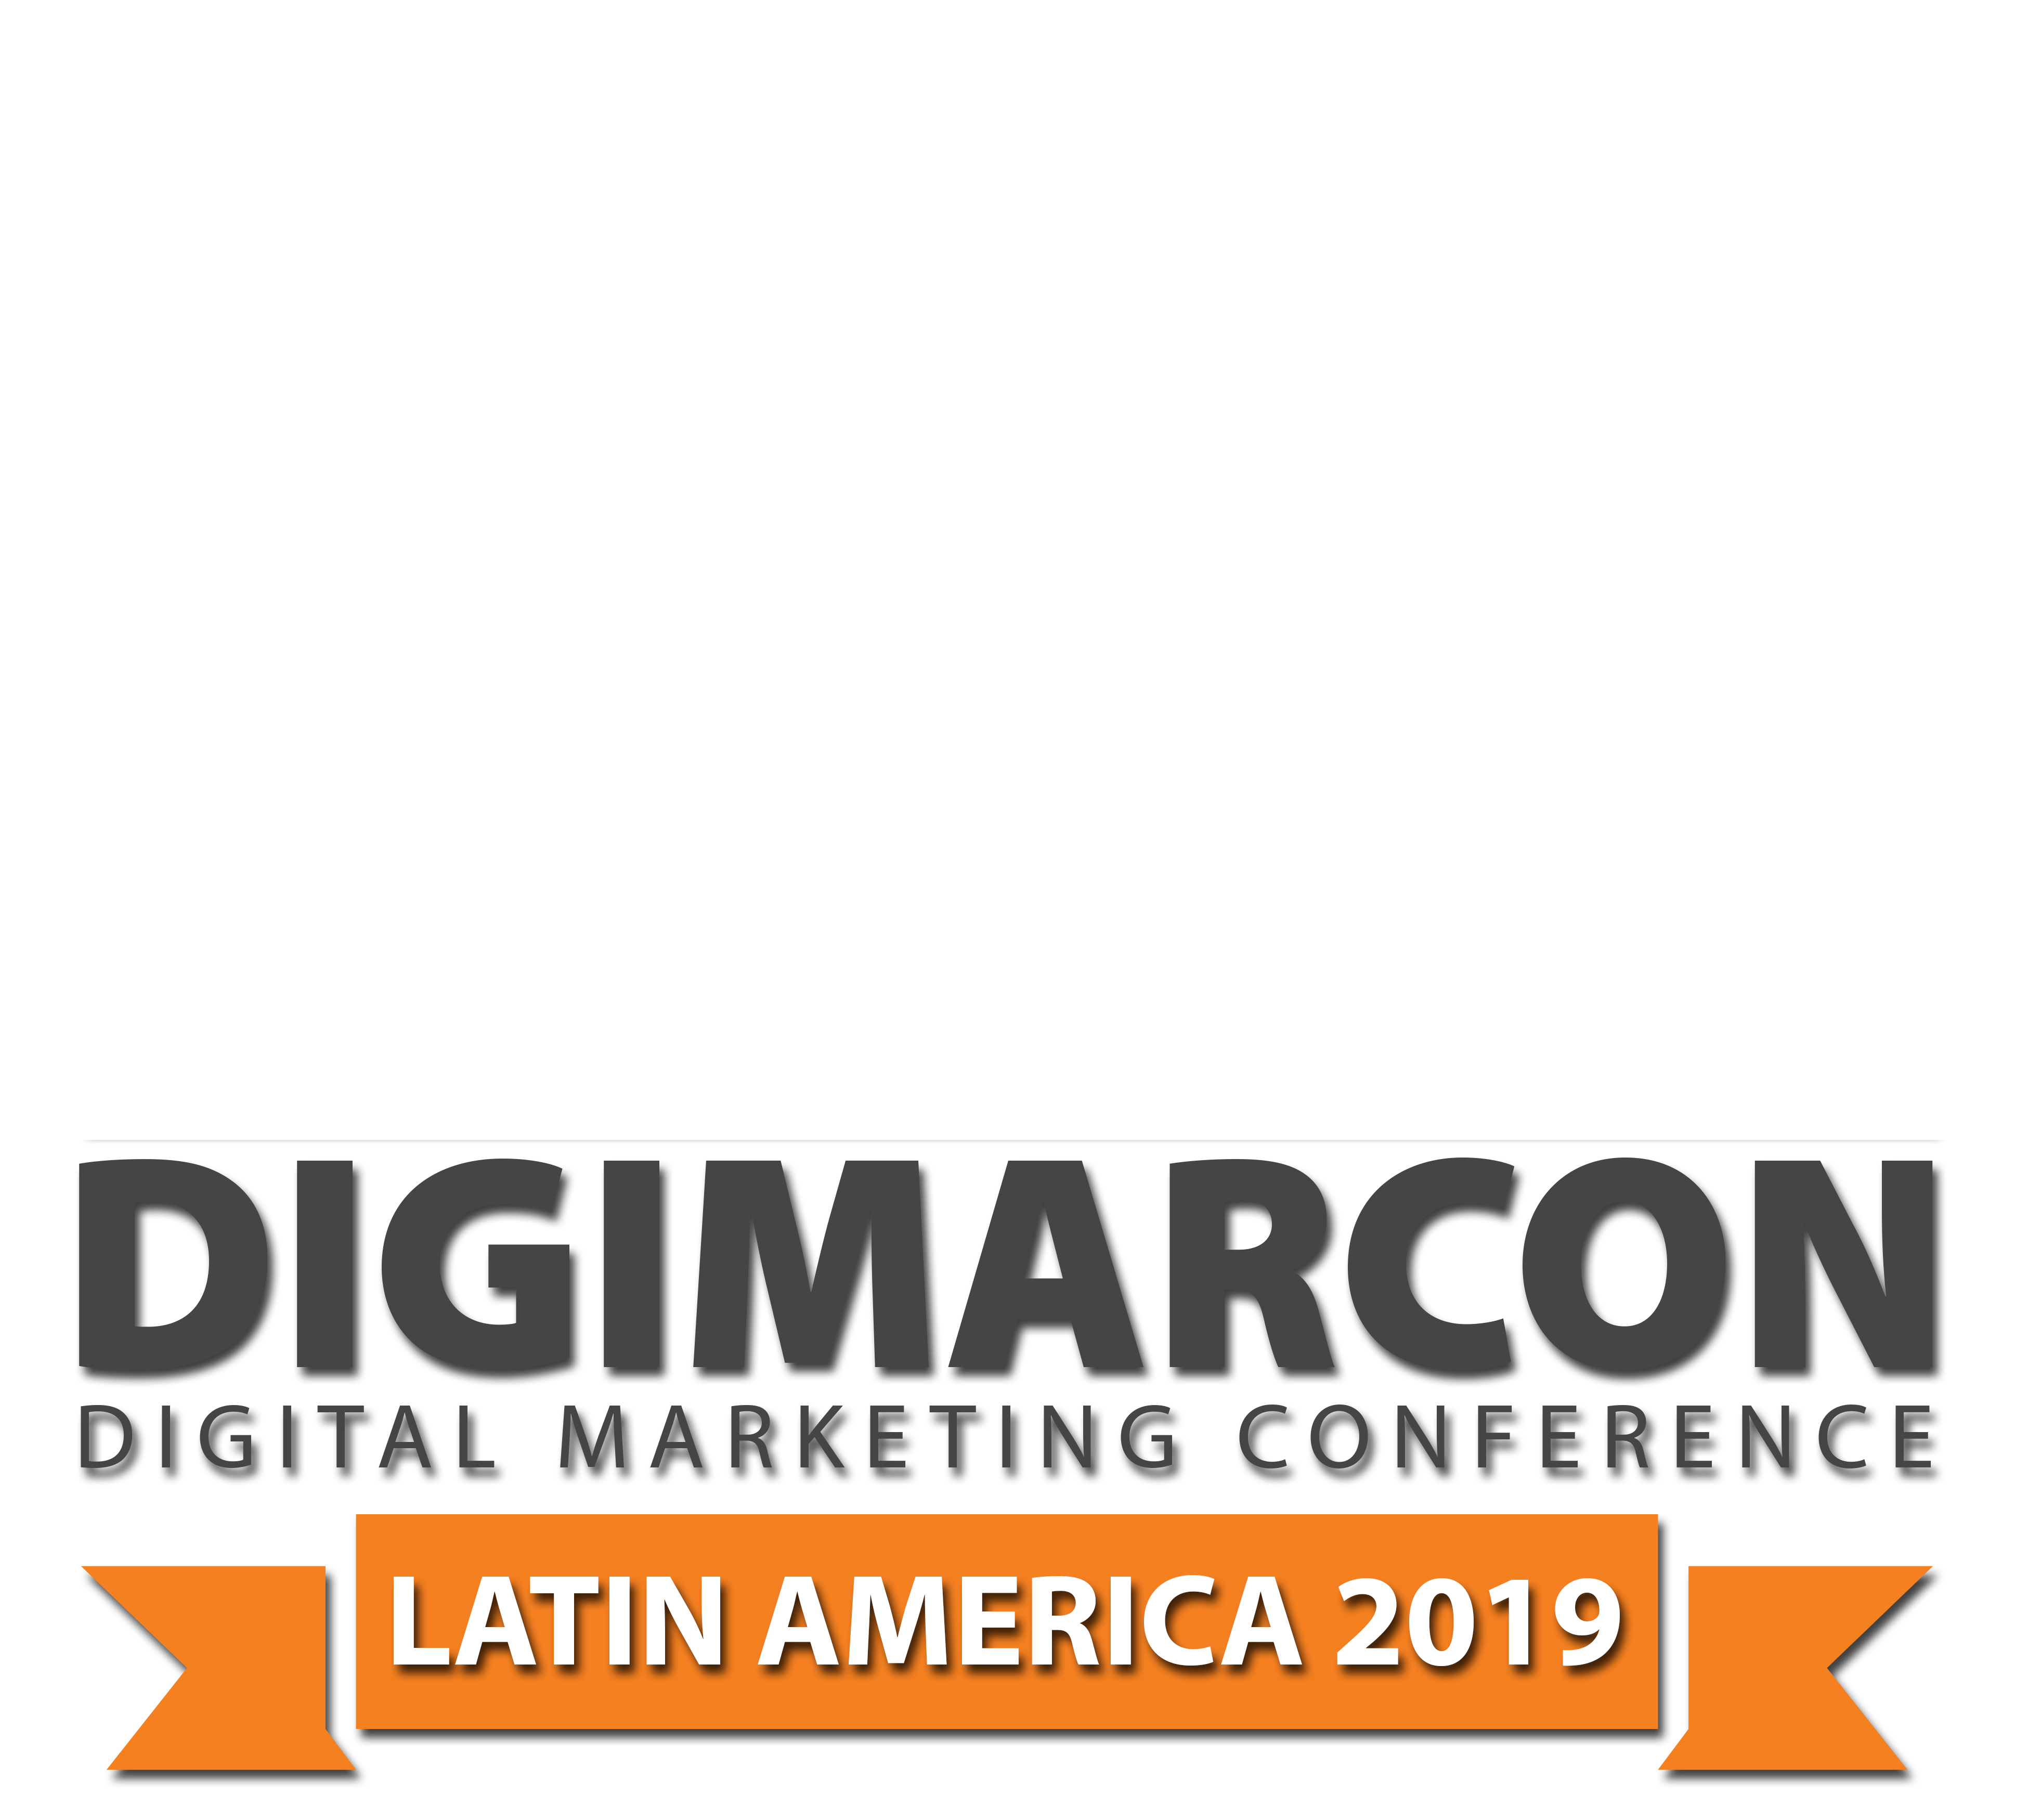 Speakers: DigiMarCon Latin America 2019 · Digital Marketing